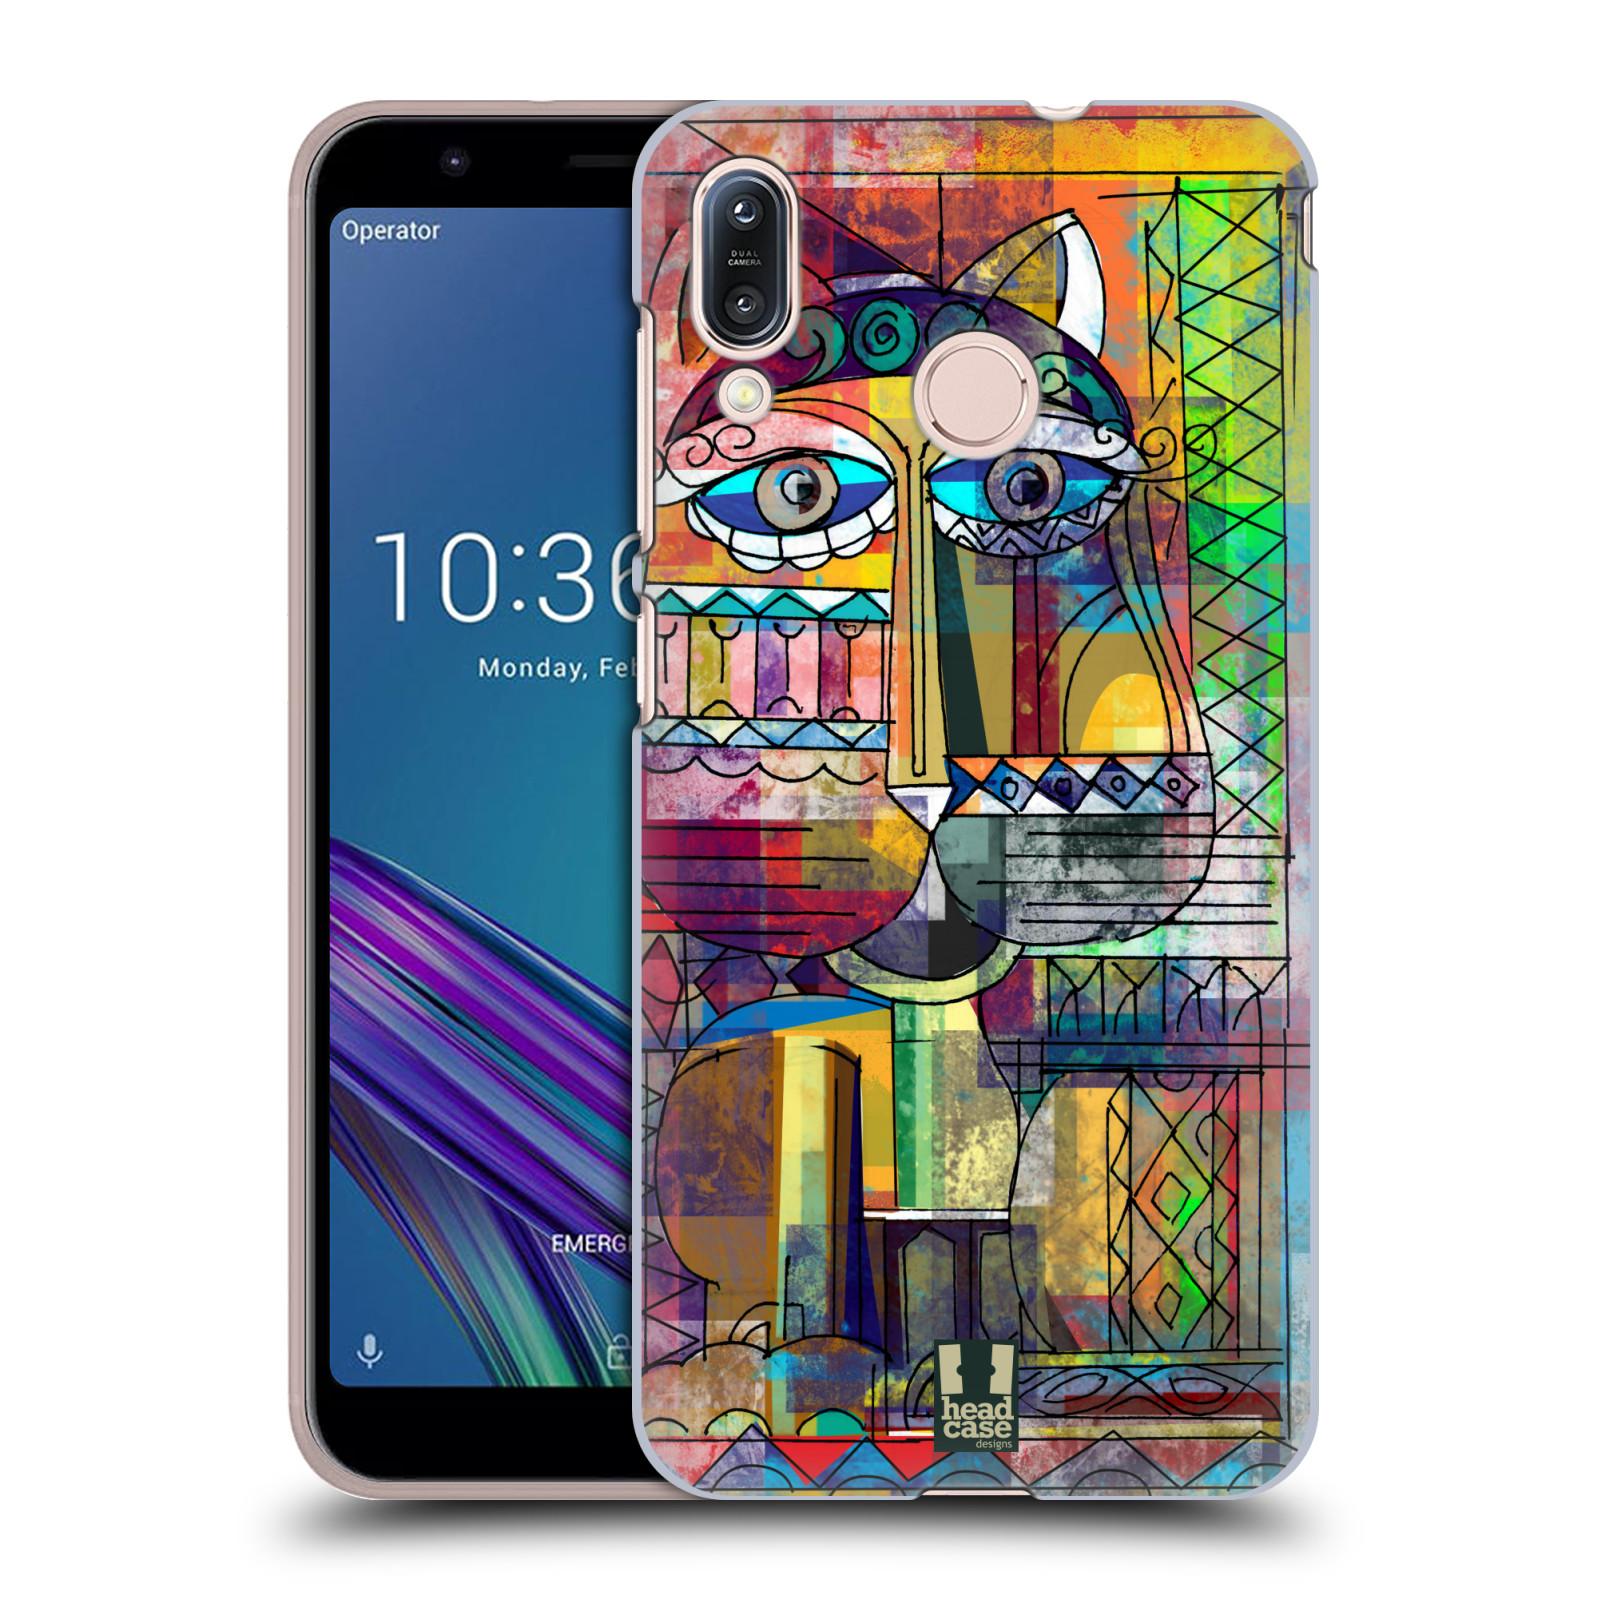 Plastové pouzdro na mobil Asus Zenfone Max M1 ZB555KL - Head Case - AZTEC KORAT